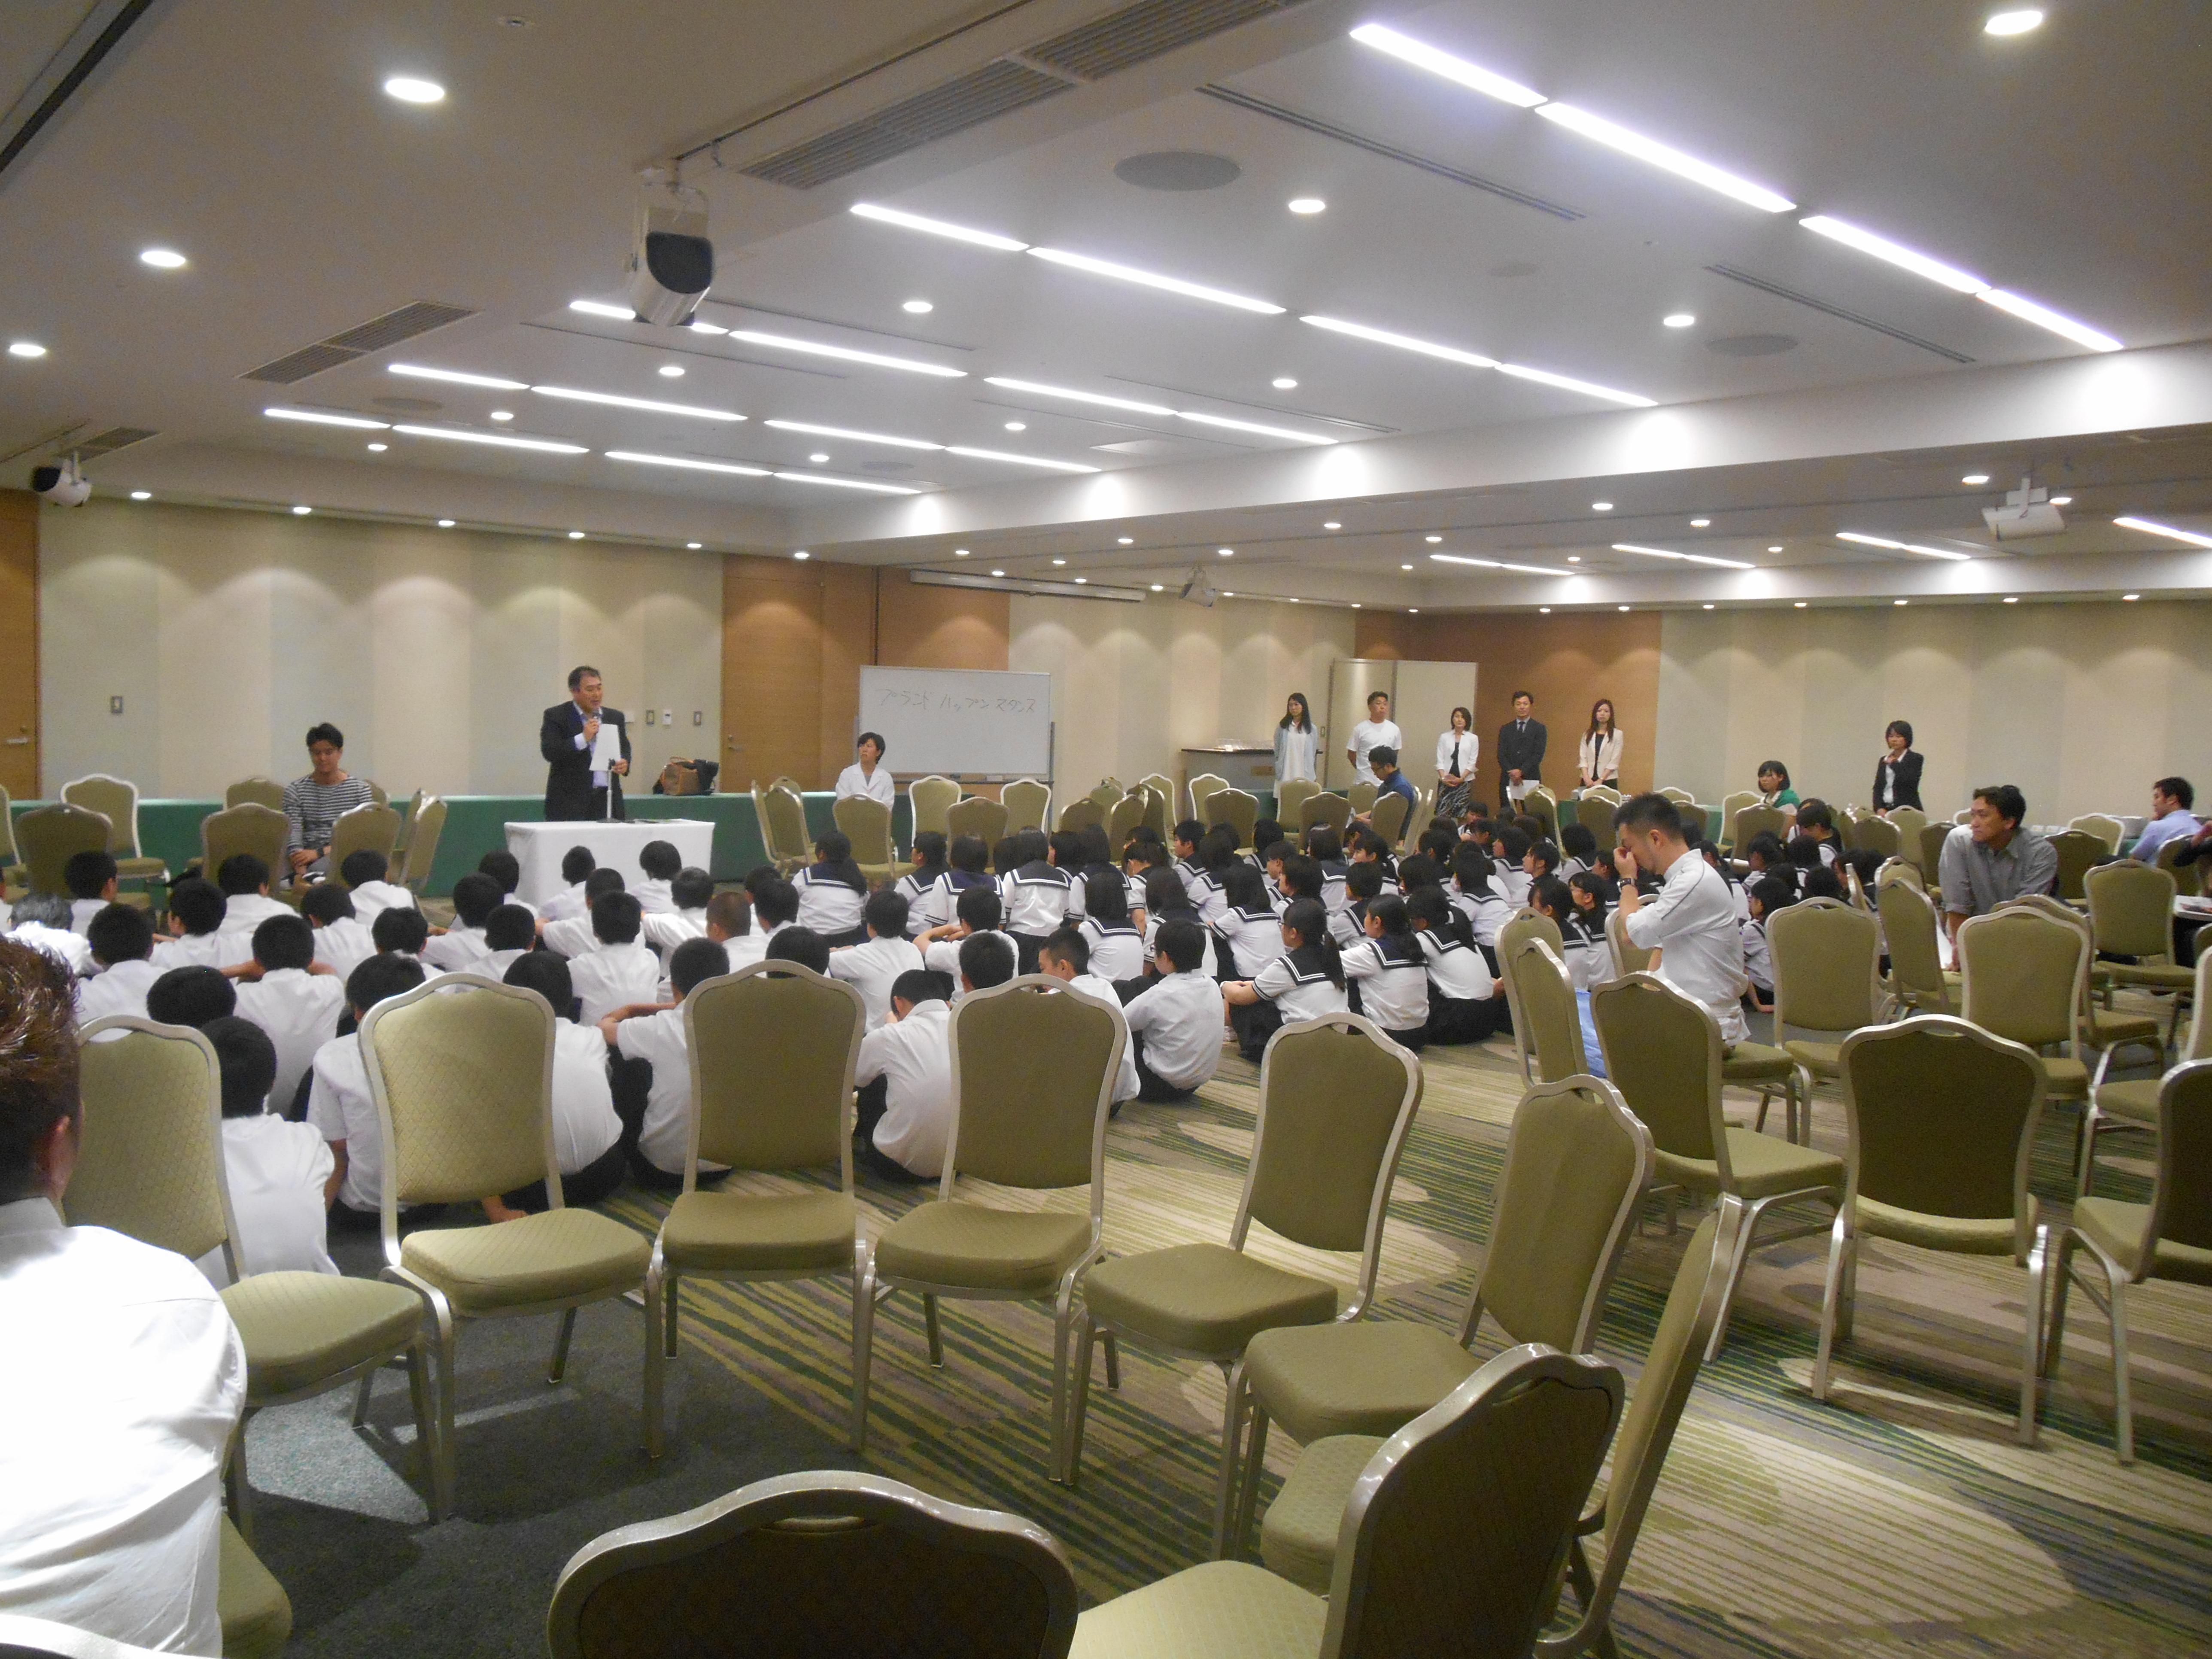 DSCN4380 - AOsuki フューチャーズゼミ事前飲み会議 2018年4月18日の青森市の中学校がAFS決定しました。